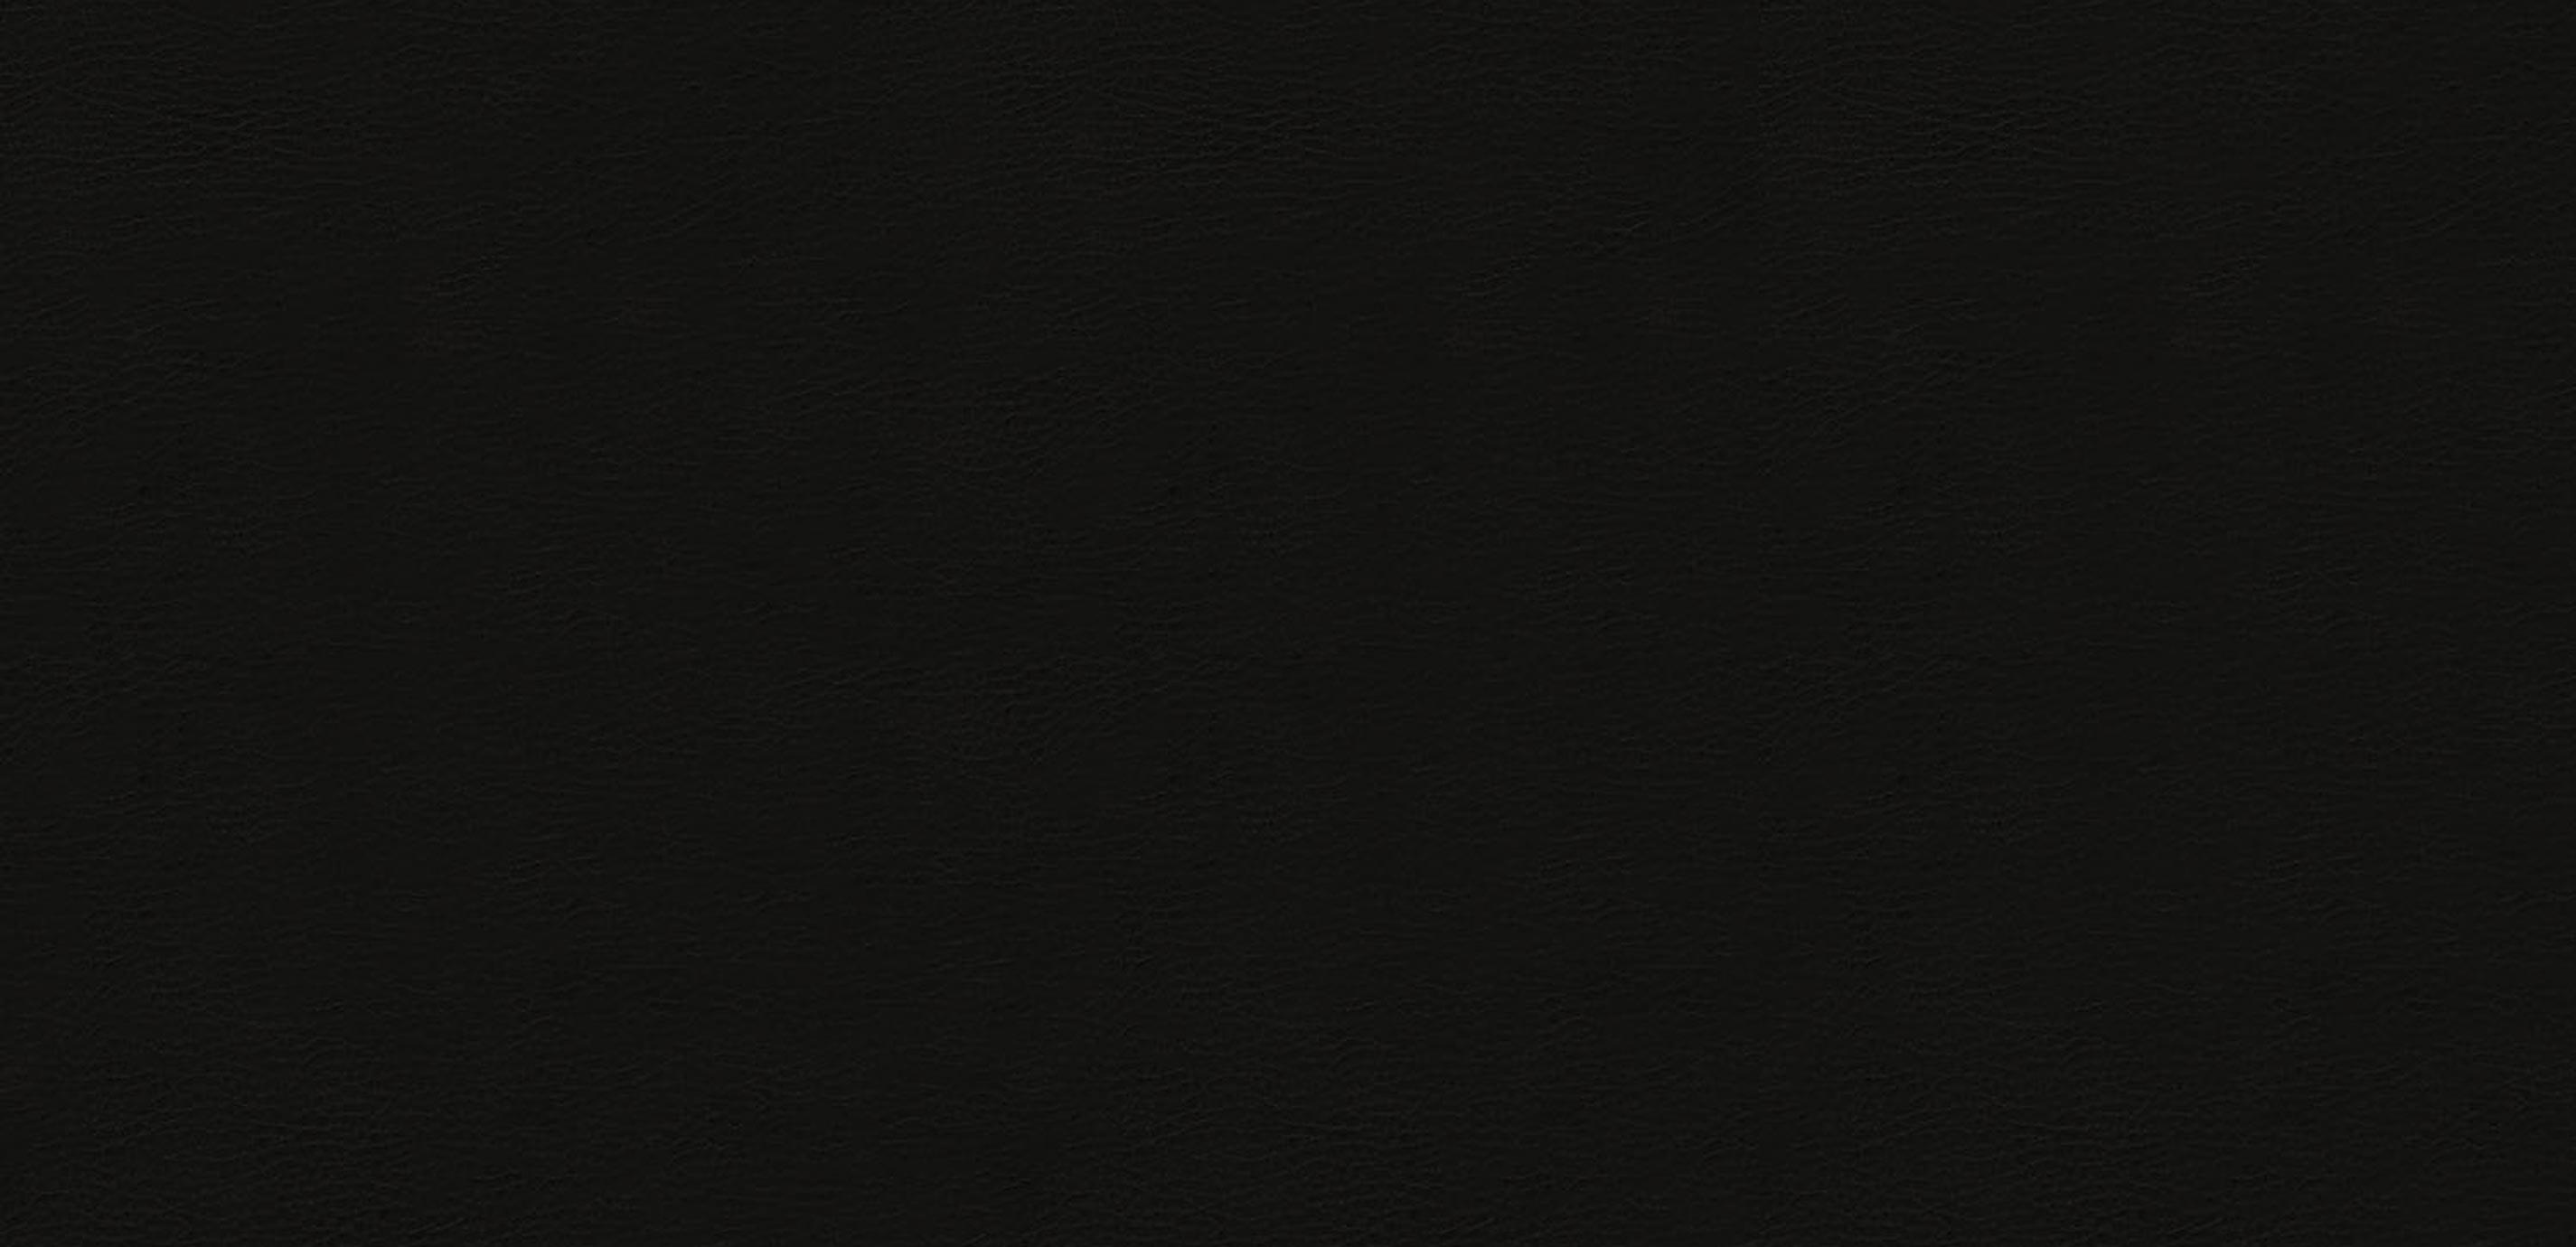 Anson Black Leather Swatch  Ethan Allen  Ethan Allen